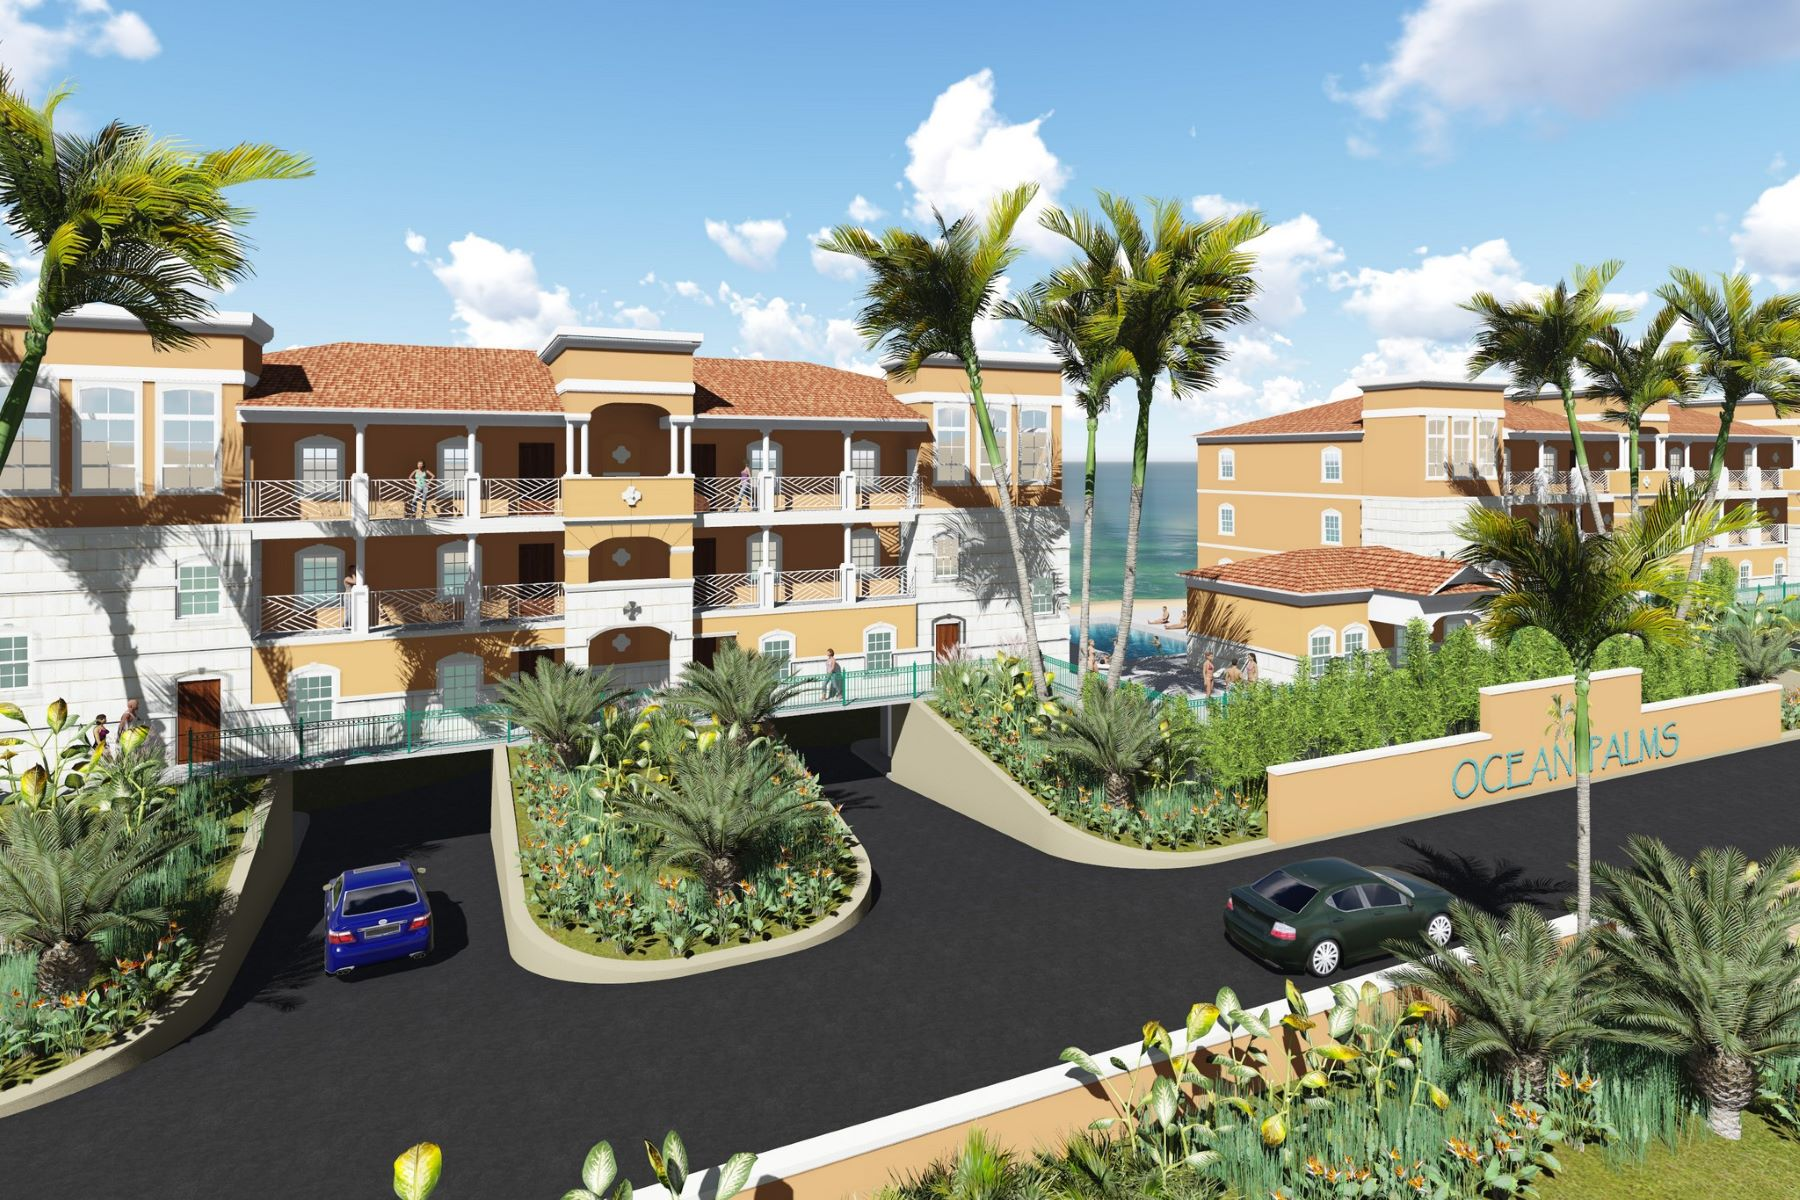 Condomínio para Venda às Ocean Palms 4804 Ocean Palms Drive #N302 Fort Pierce, Florida, 34949 Estados Unidos